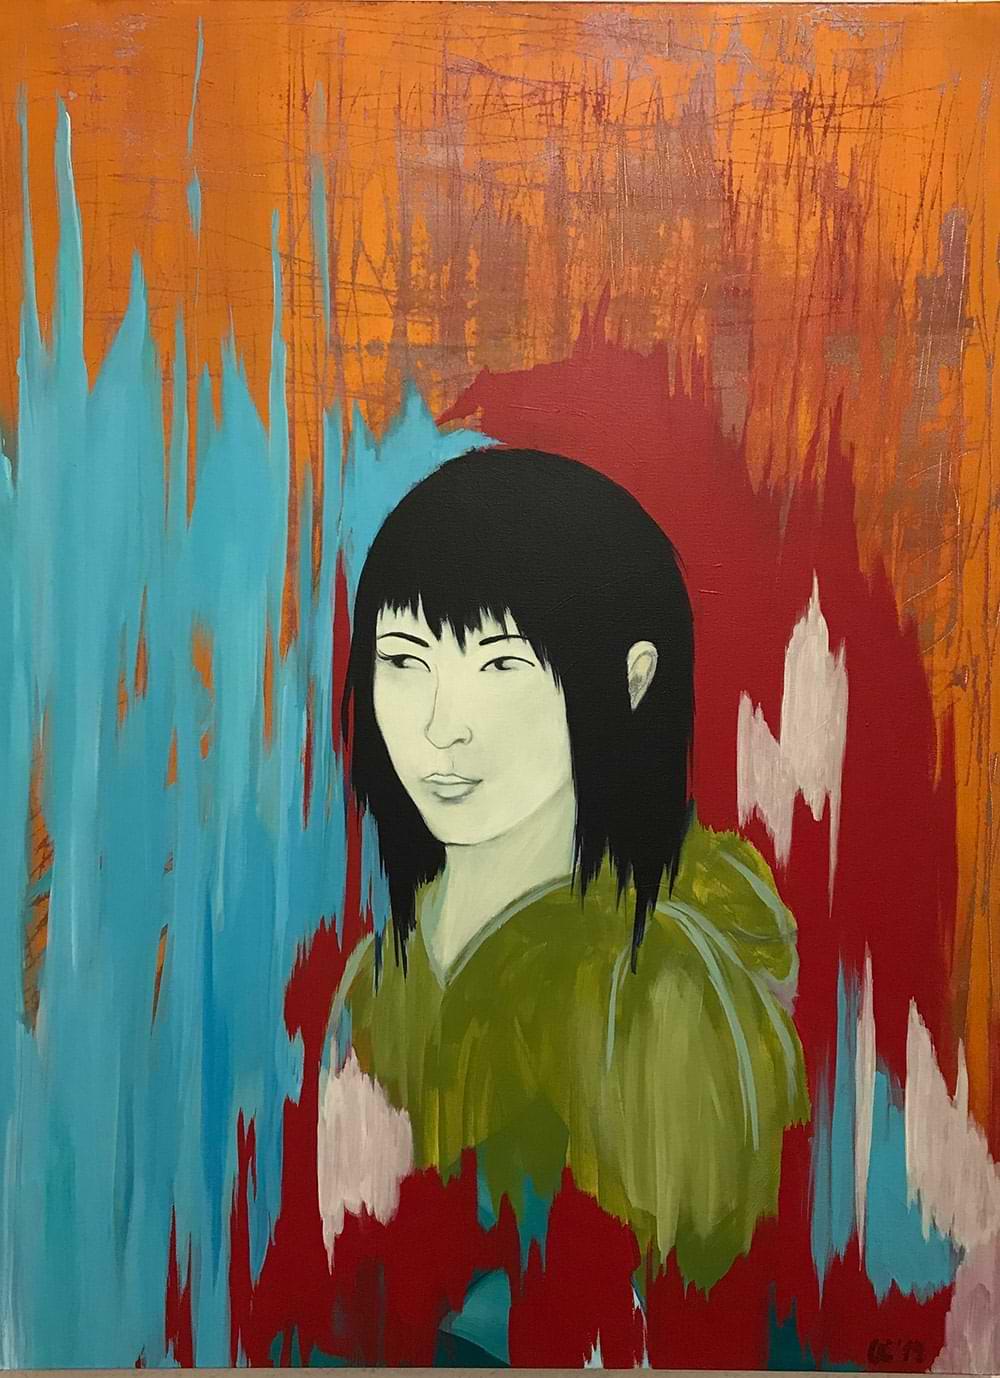 christiane haag japan japaneseart japaneseculture harukimurakami killingcommendatore painting malerei